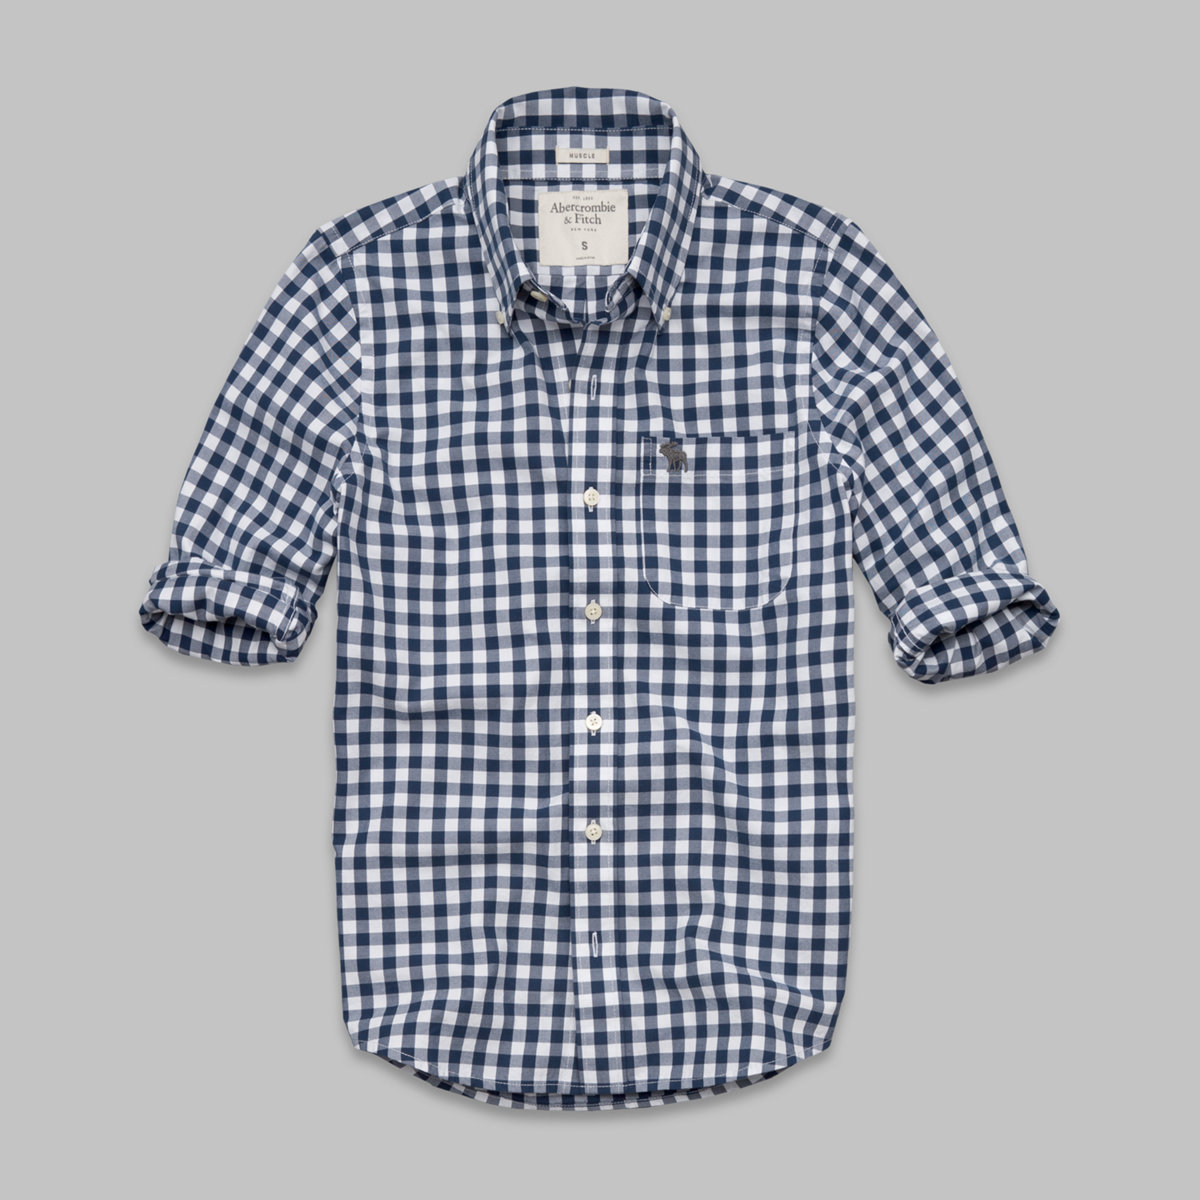 Henderson Lake Shirt